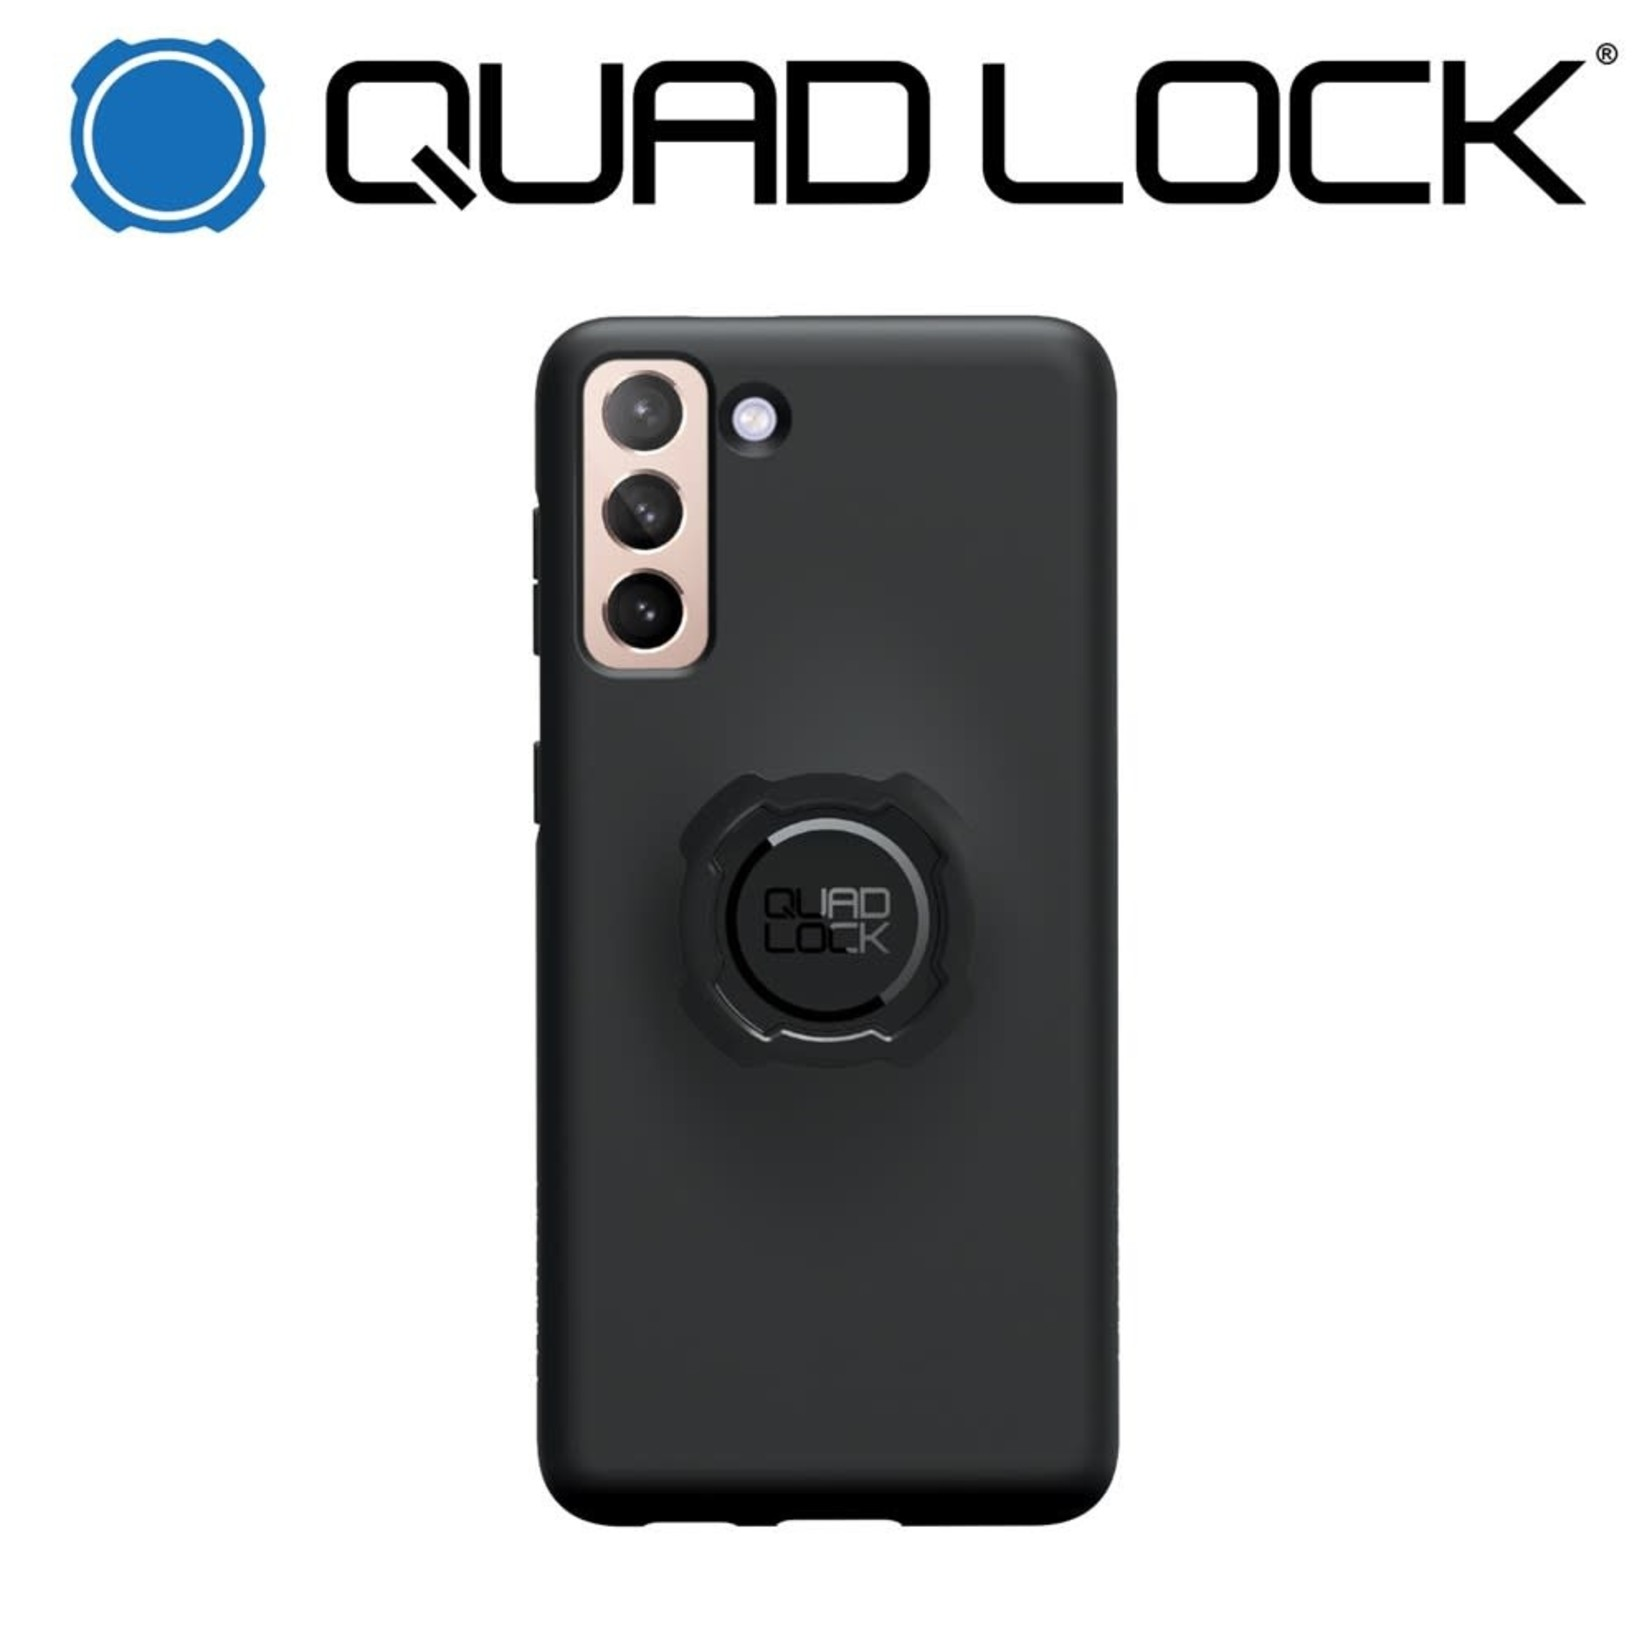 Quad Lock Samsung Galaxy S21+ Case